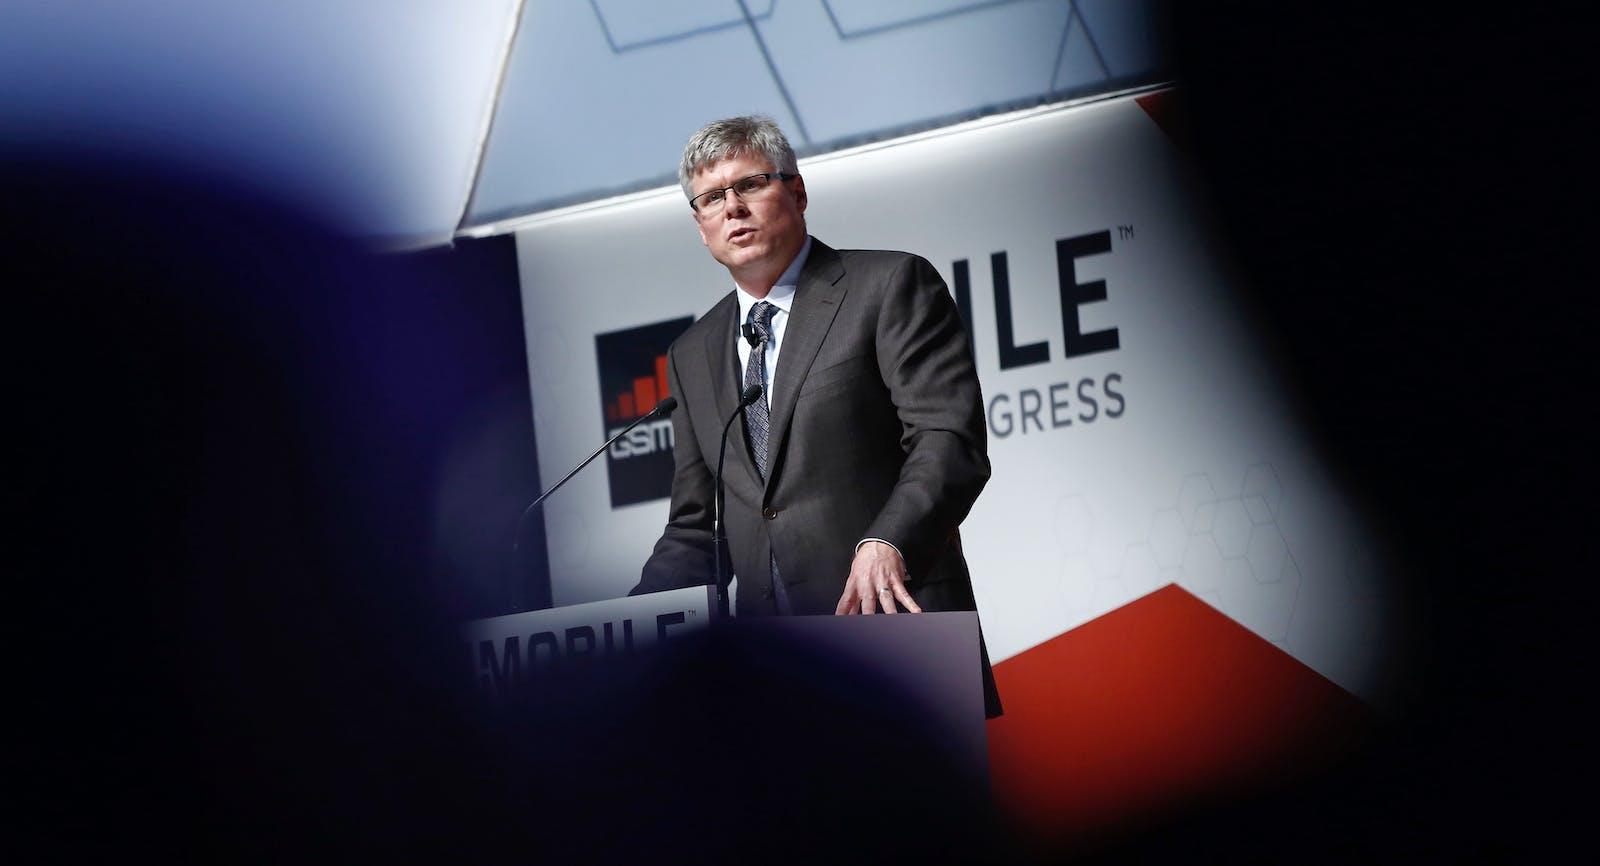 Qualcomm CEO Steve Mollenkopf. Photo by Bloomberg.